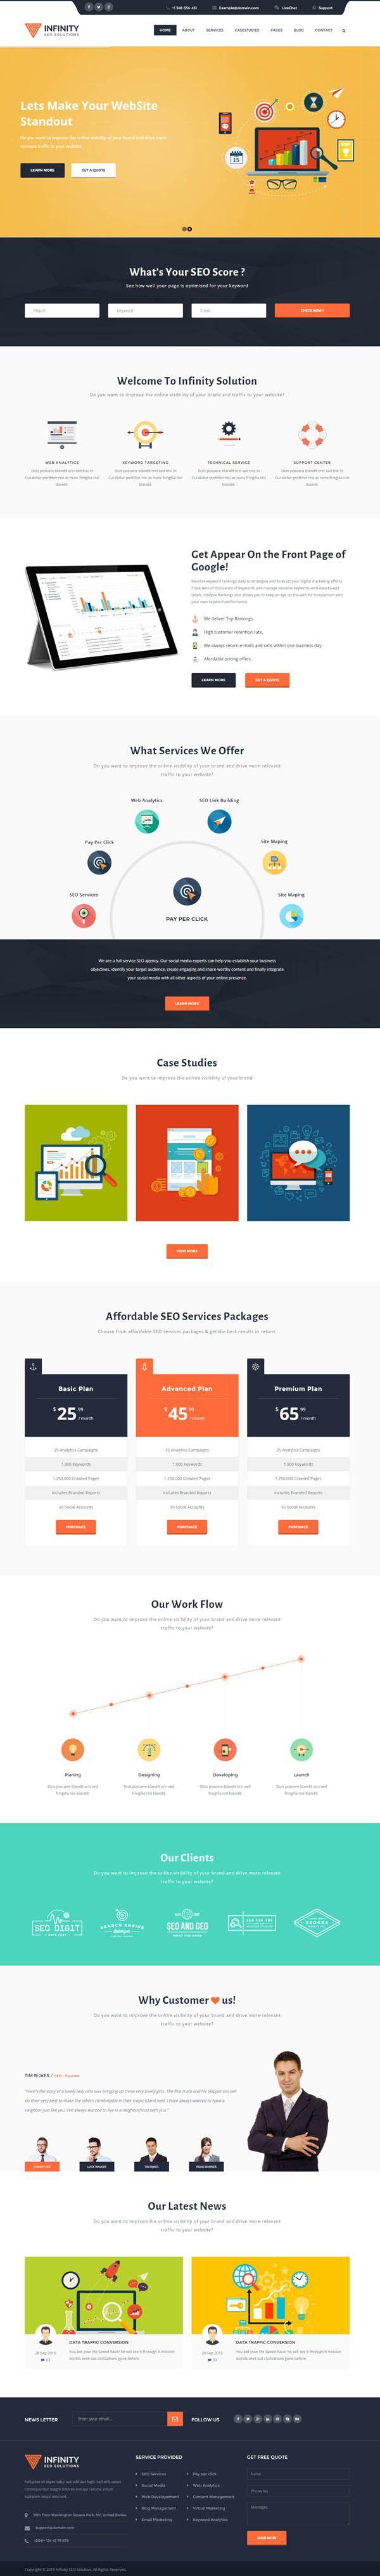 Best PSD Templates Images On Pinterest - Graphic design website templates